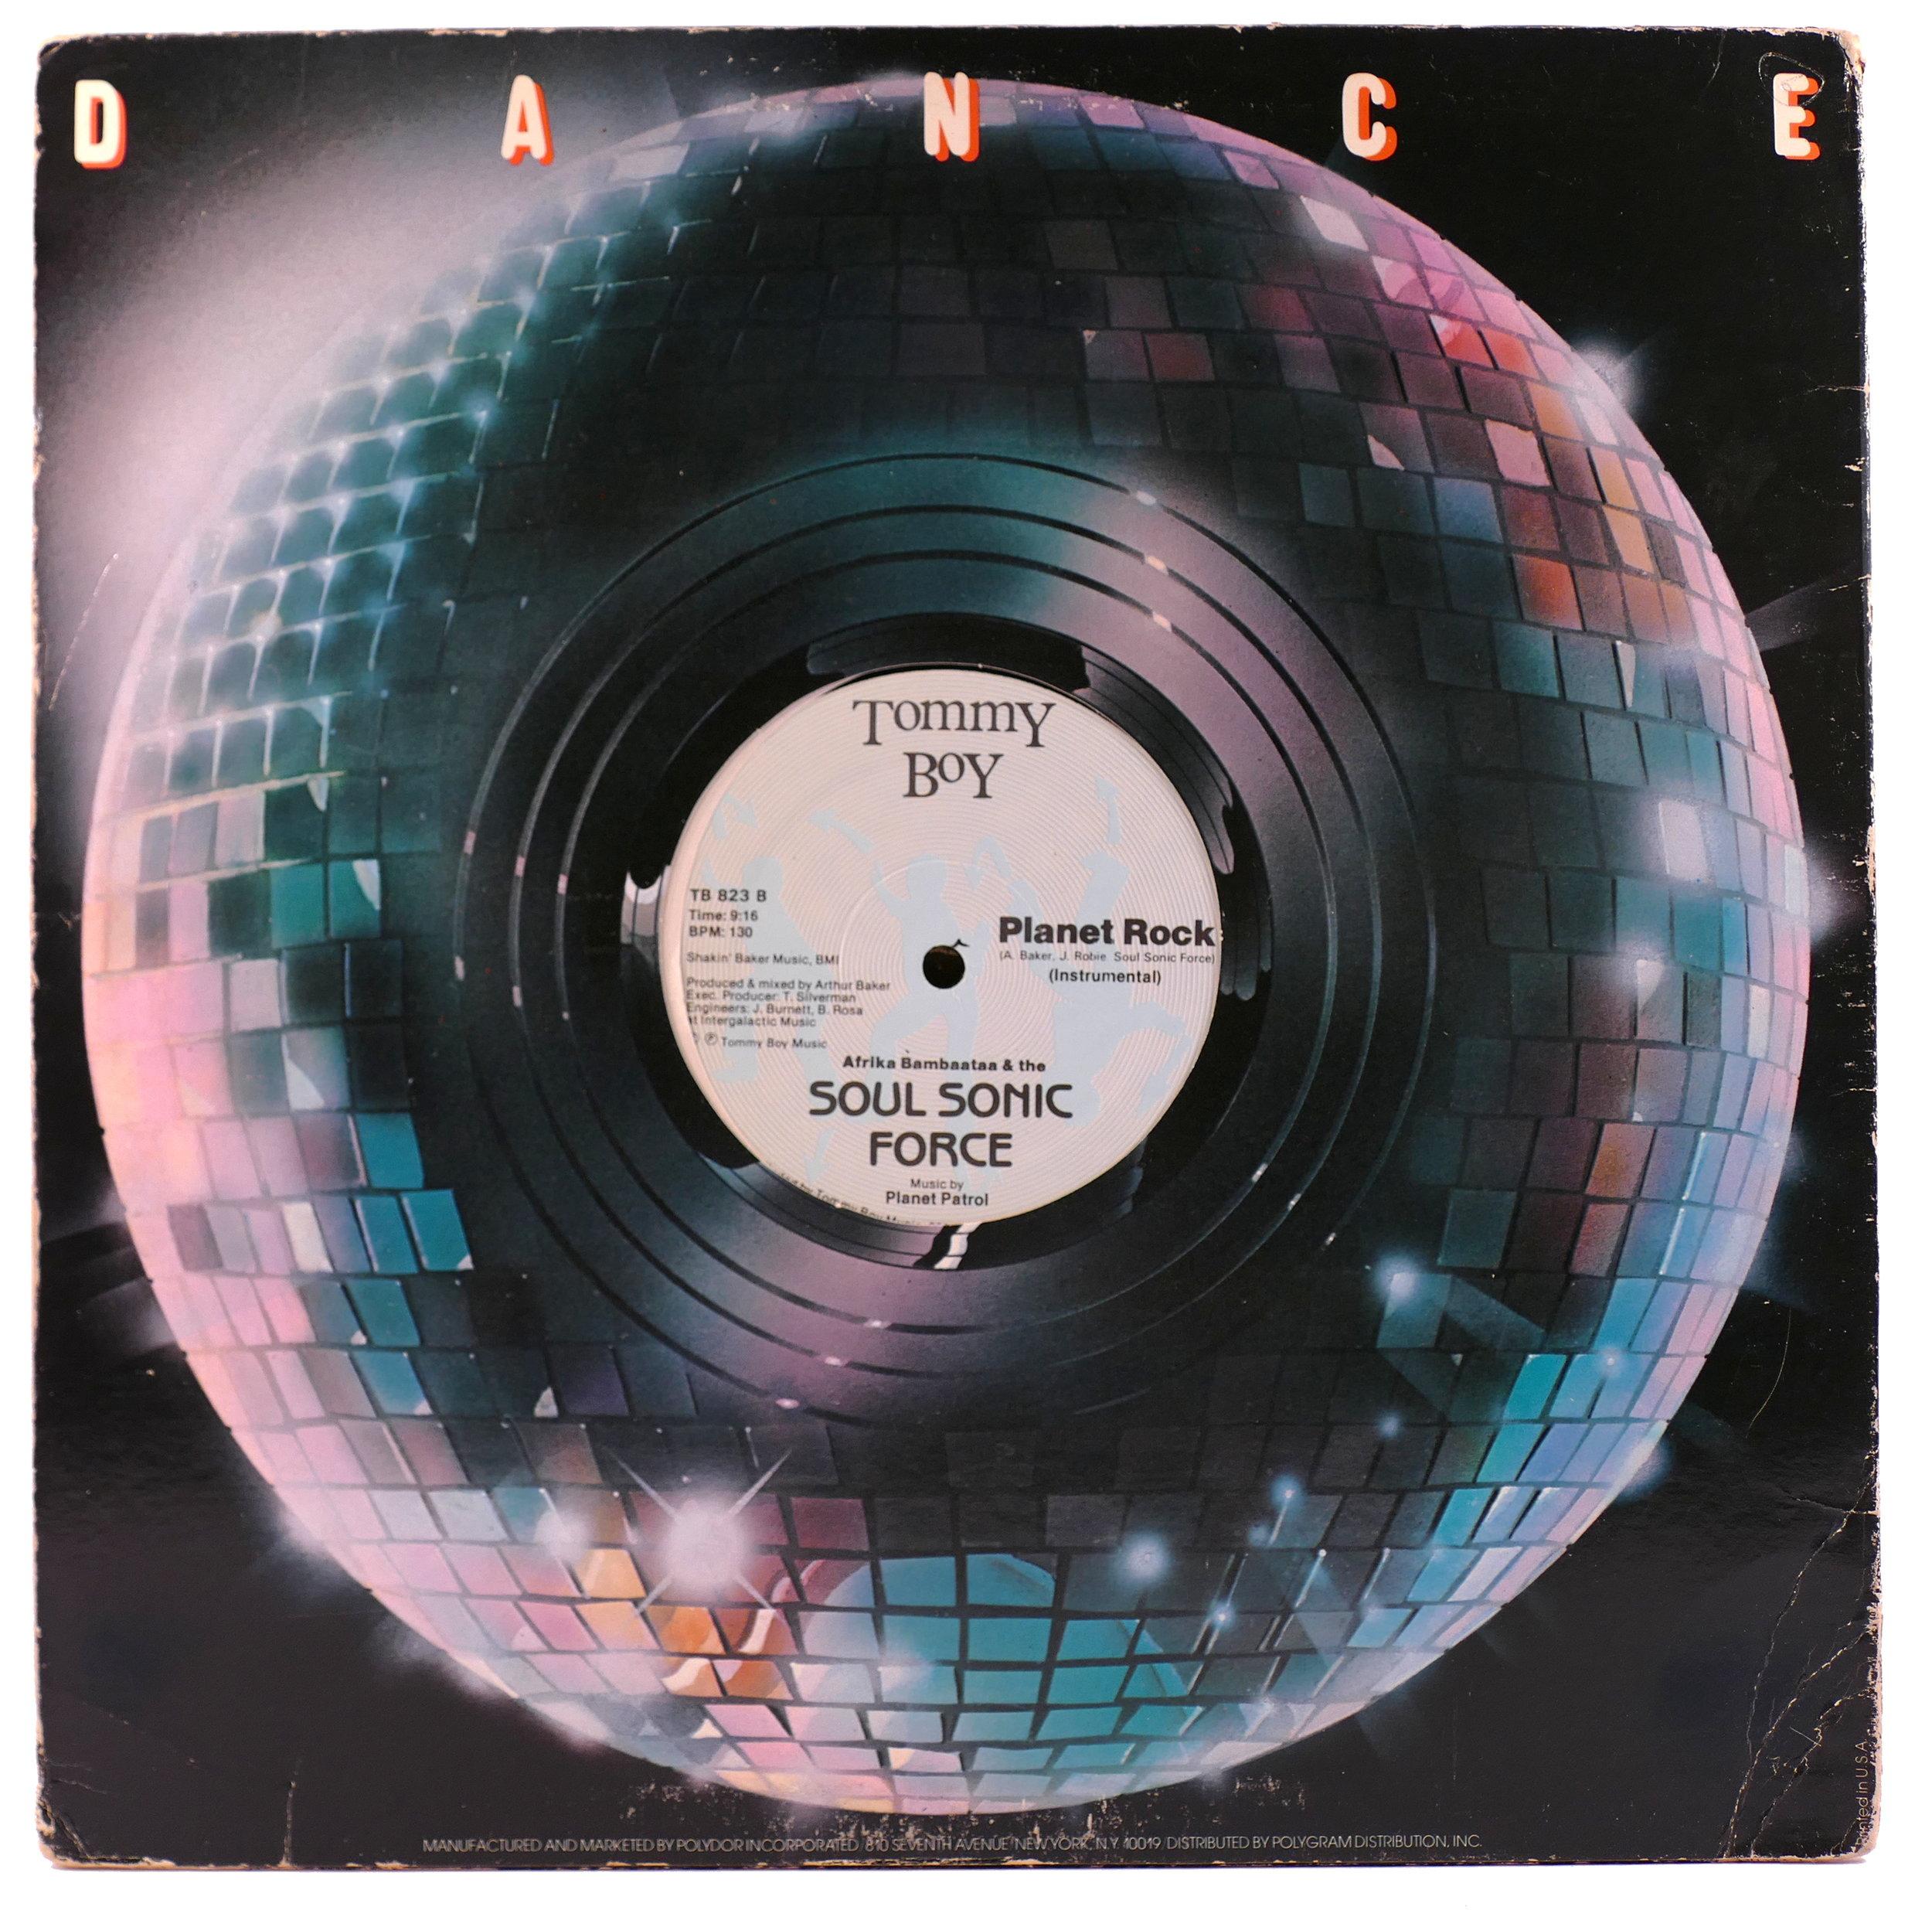 WLWLTDOO-1982-12-SOULSONIC-PLANETROCK-B.JPG